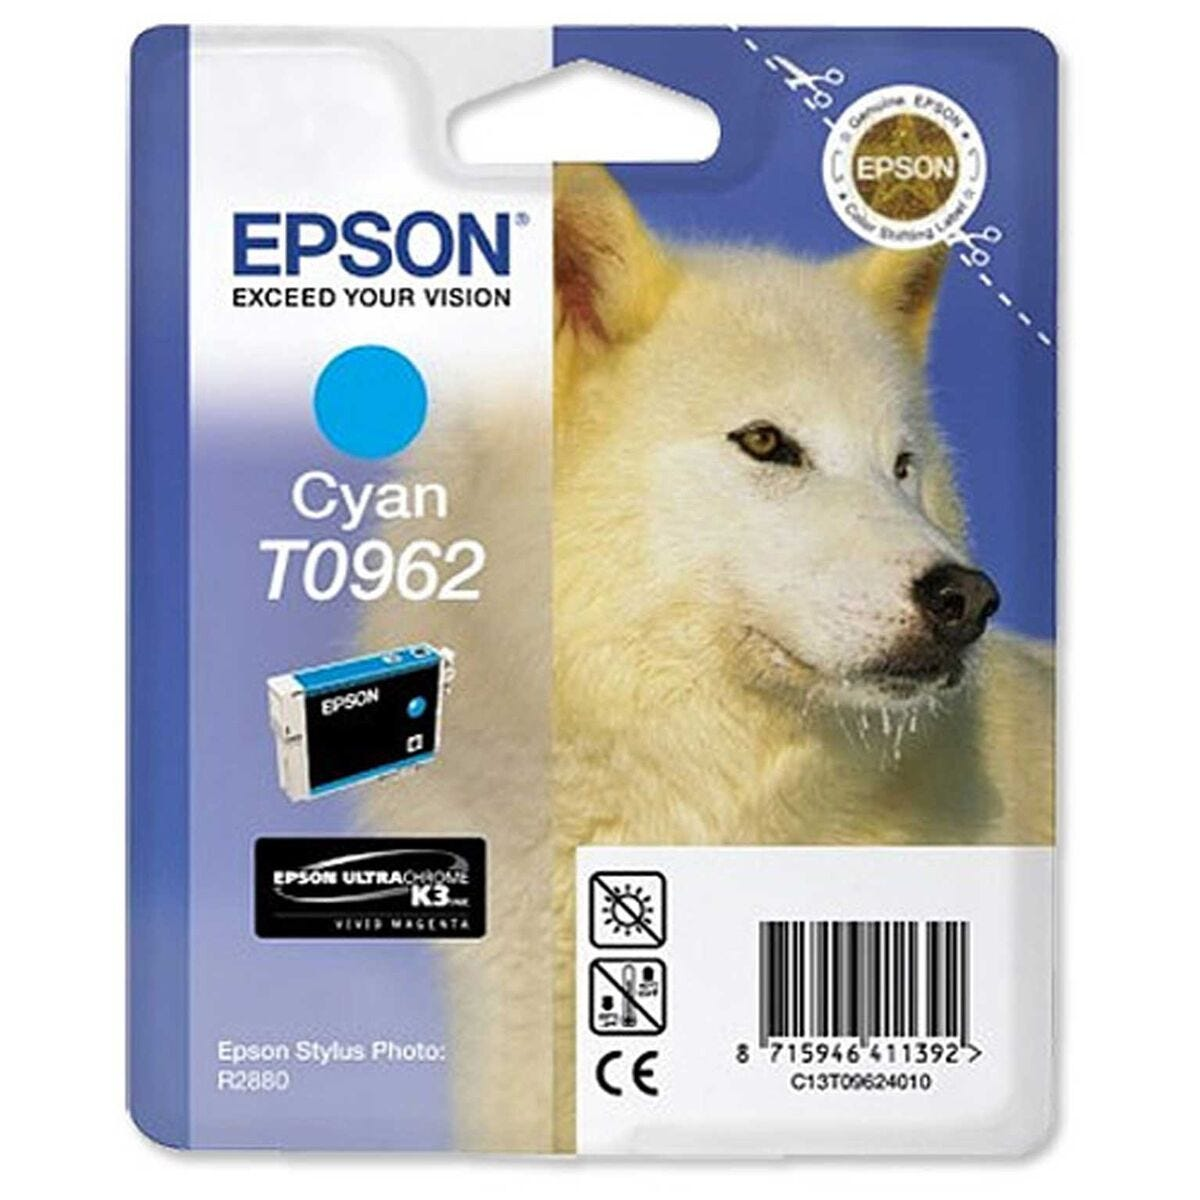 Epson T096 Stylus Cartridge